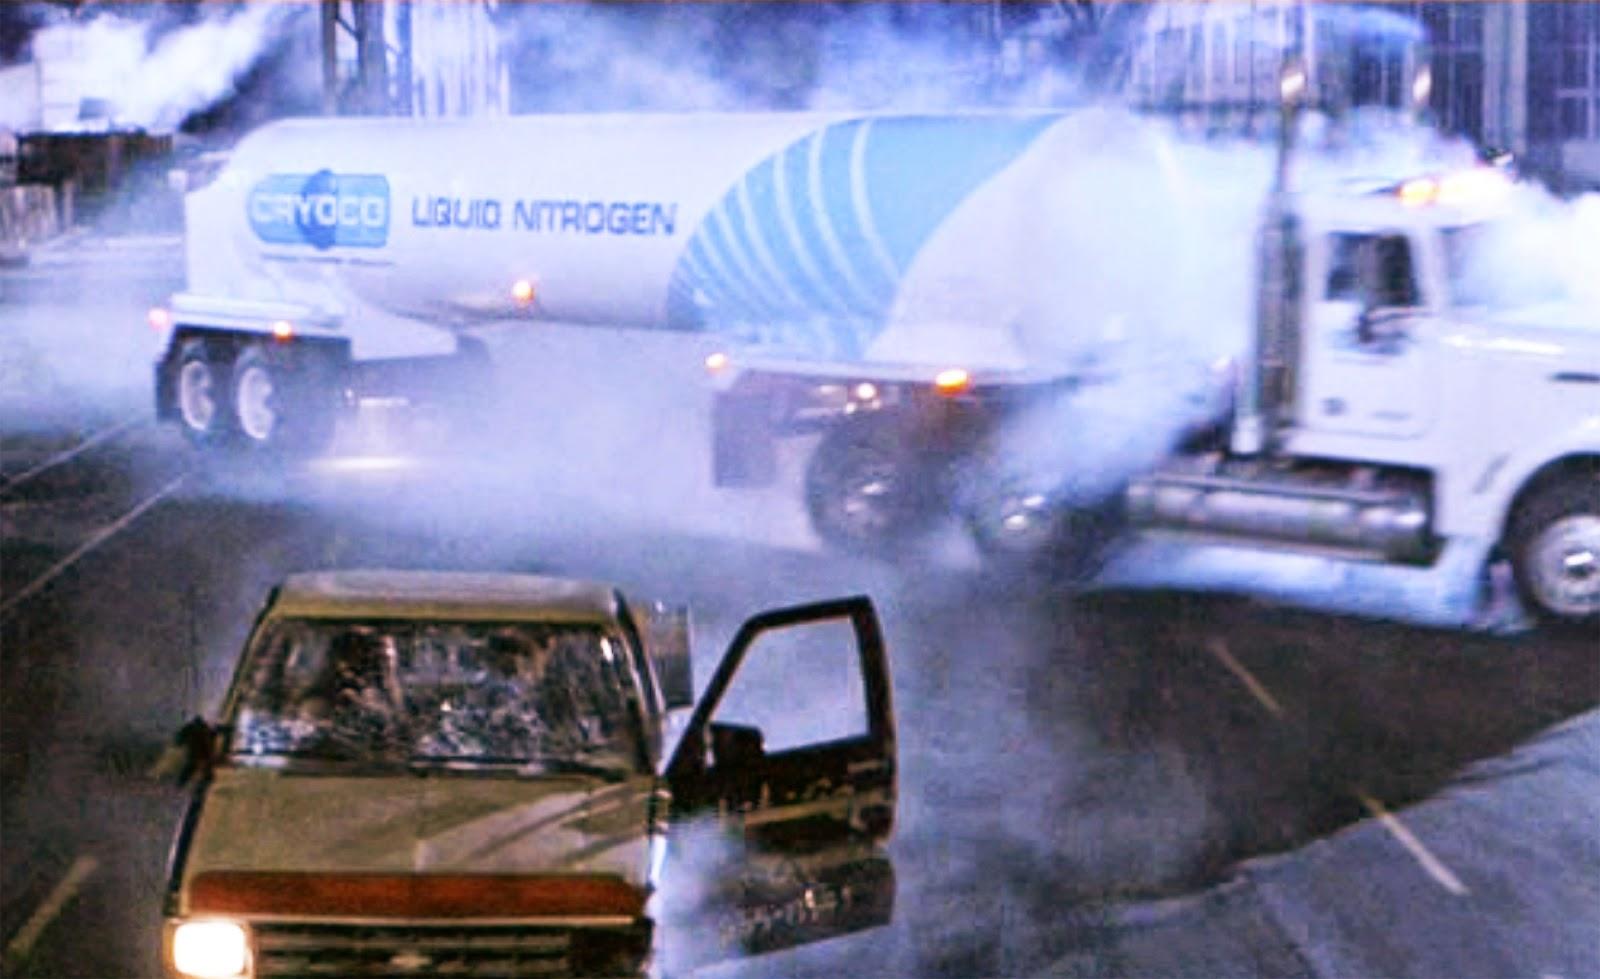 Terminator2_502Pyxurz.jpg